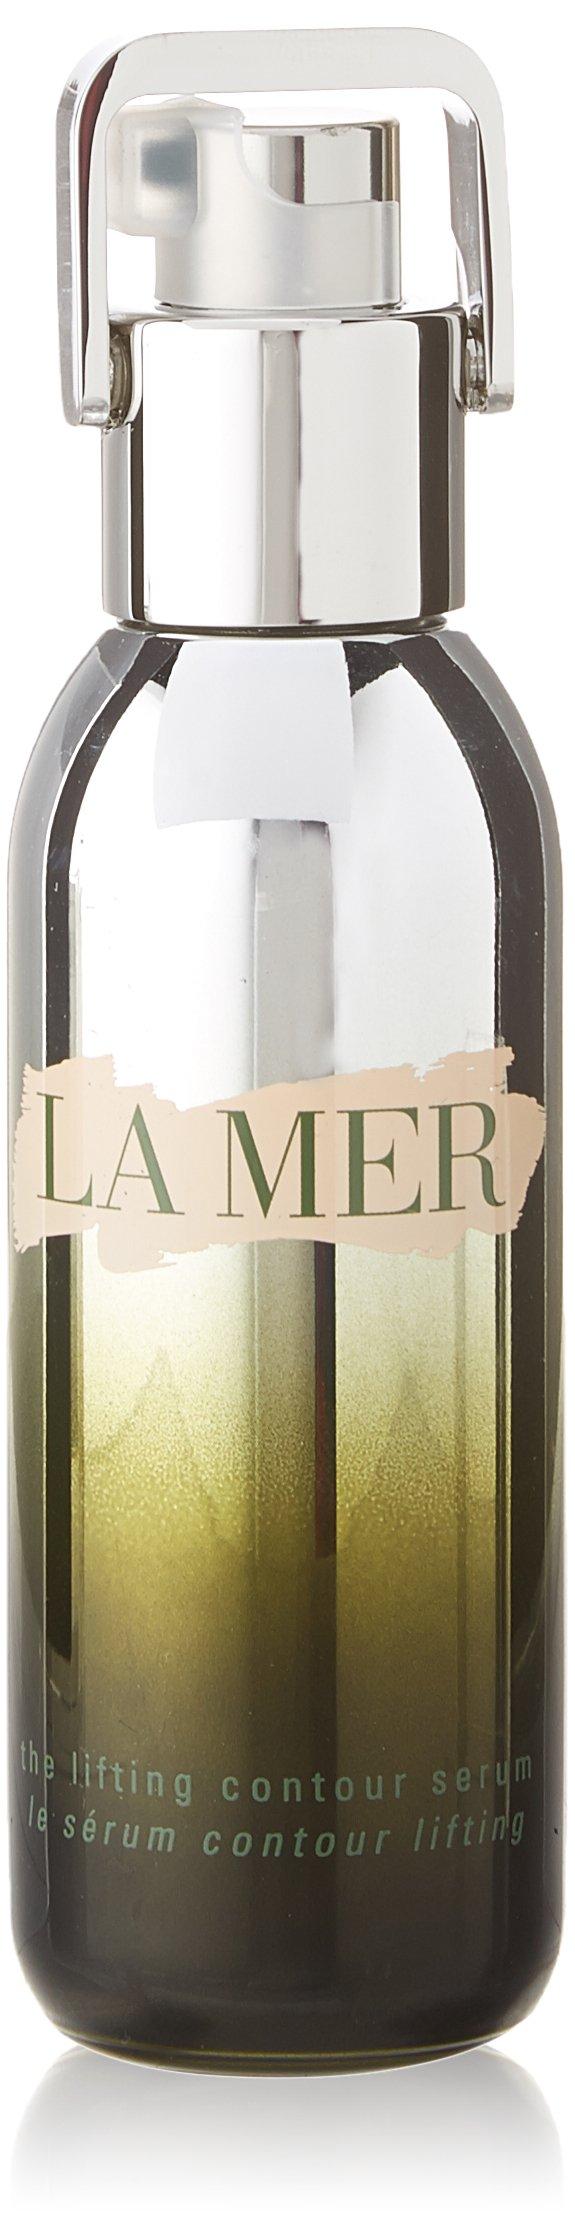 La Mer The Lifting Contour Serum - 1 Ounce